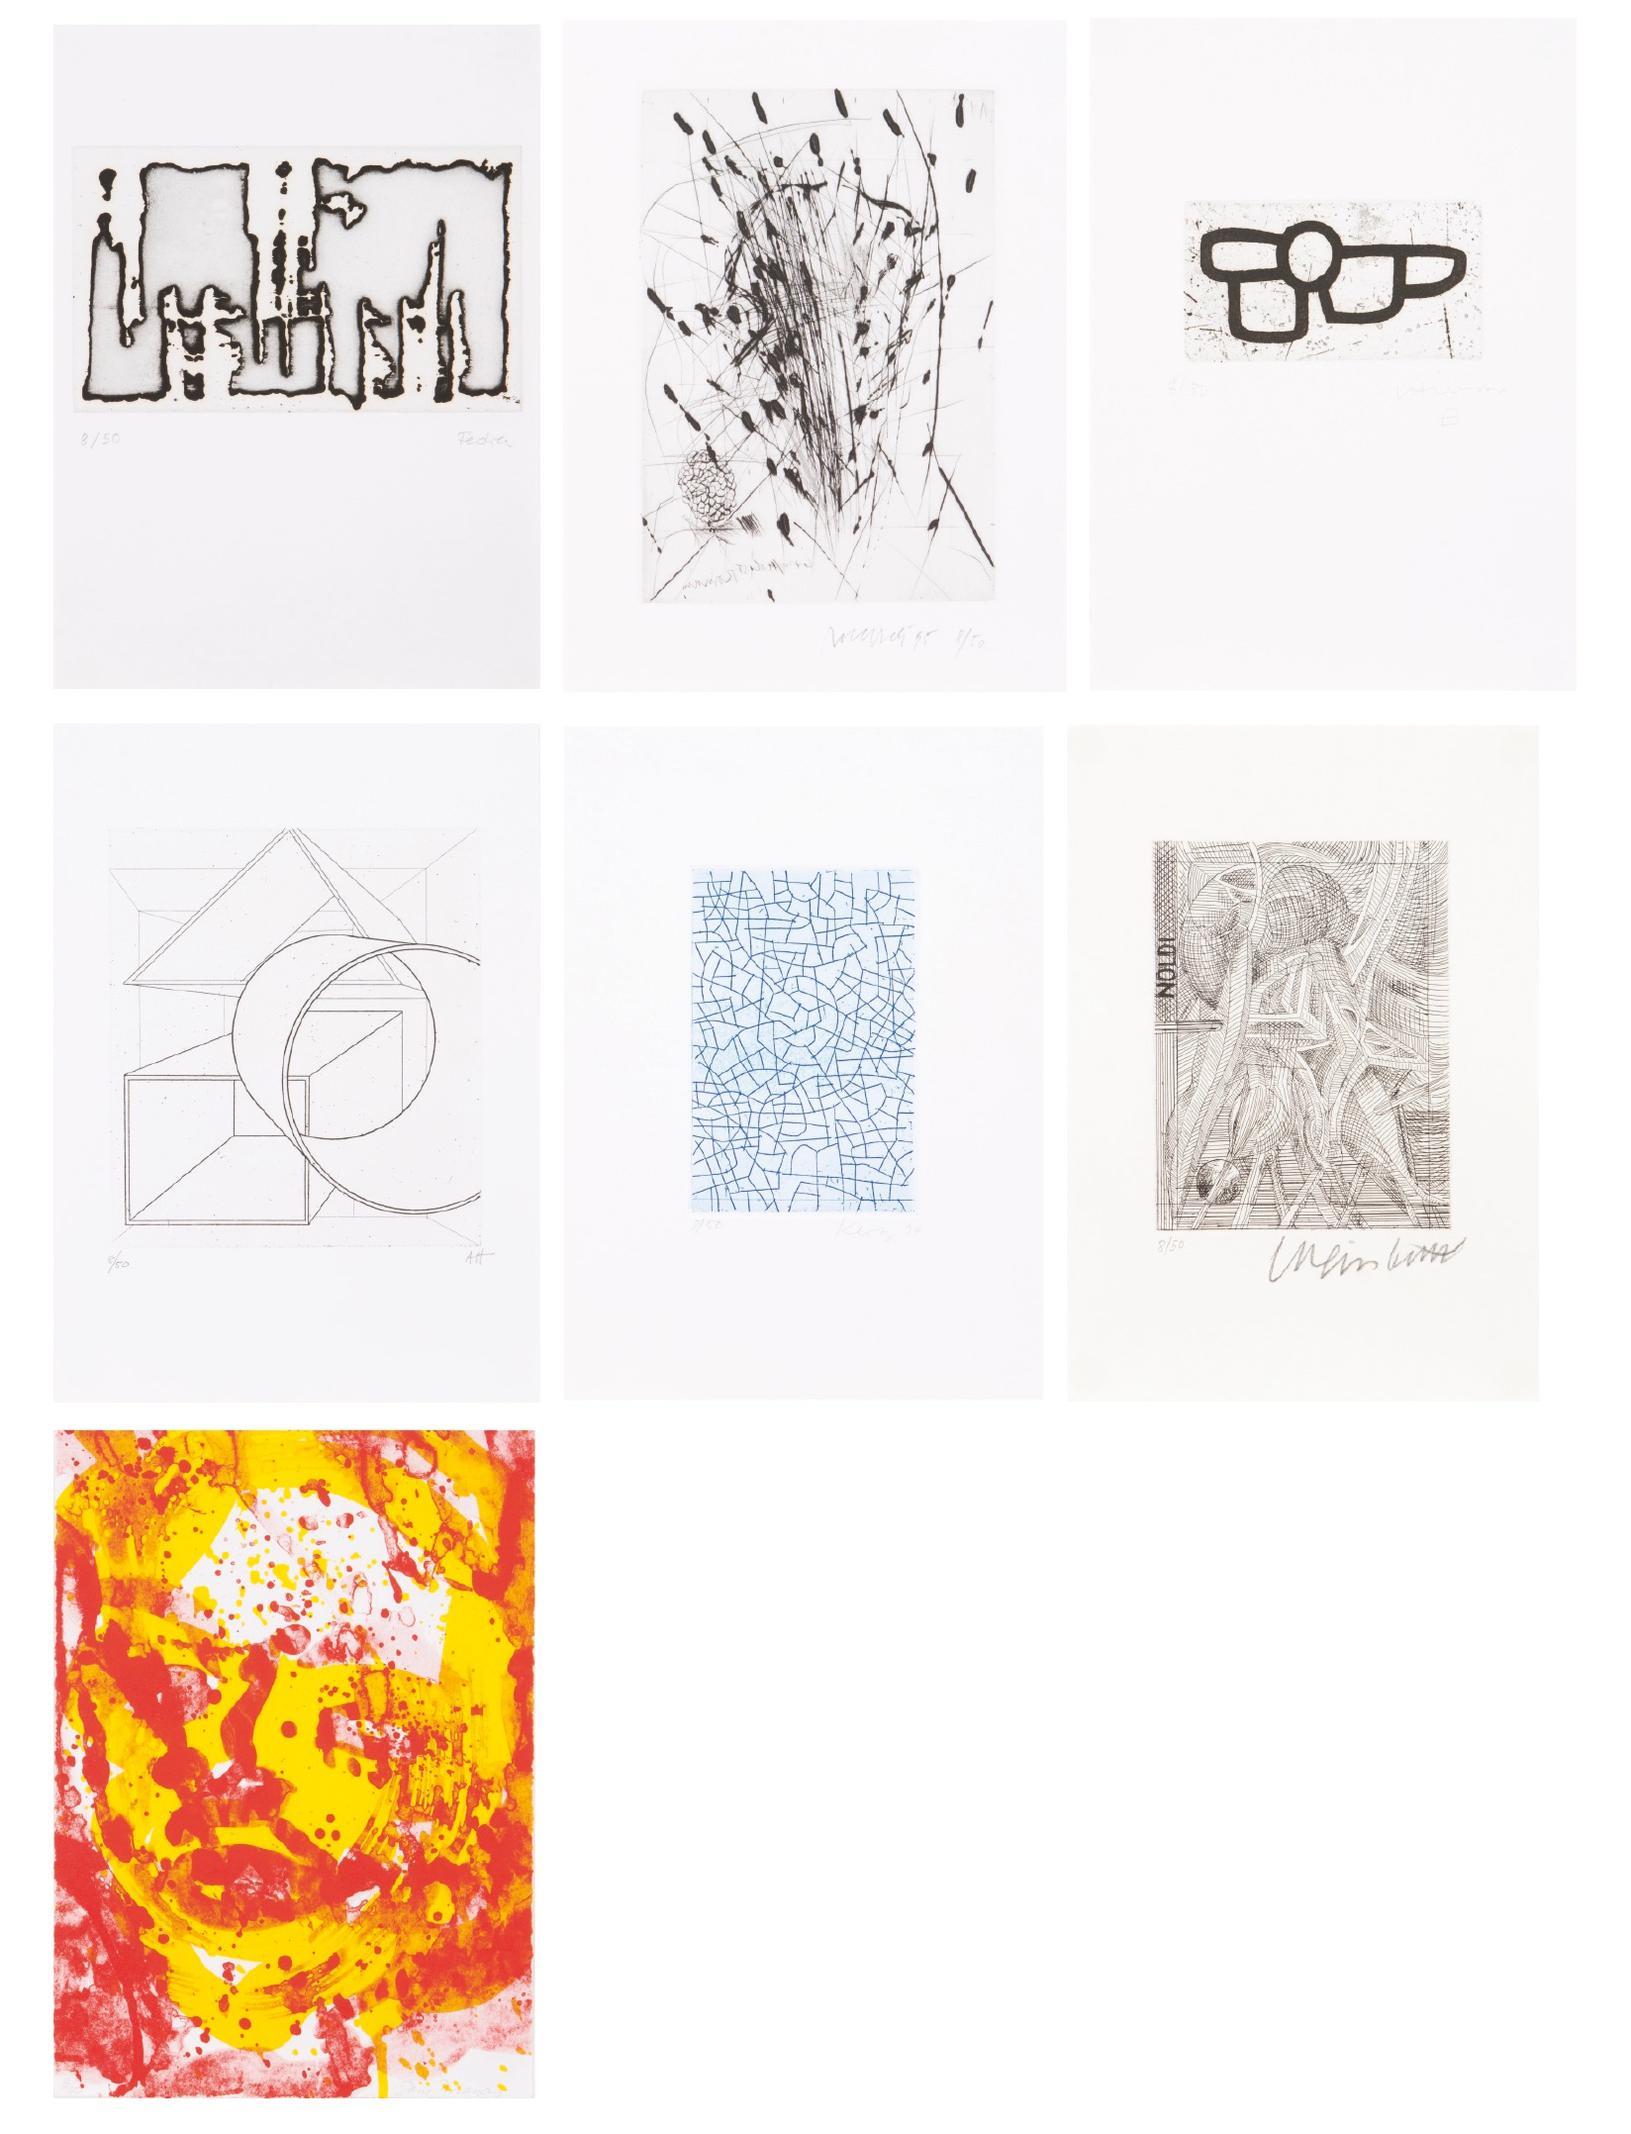 Franz Fedier, Rolf Iseli, Eduardo Chillida, Al Held, Lenz Klotz, Bernhard Luginbuhl, Sam Francis - Portfolio: Set of seven graphic works-